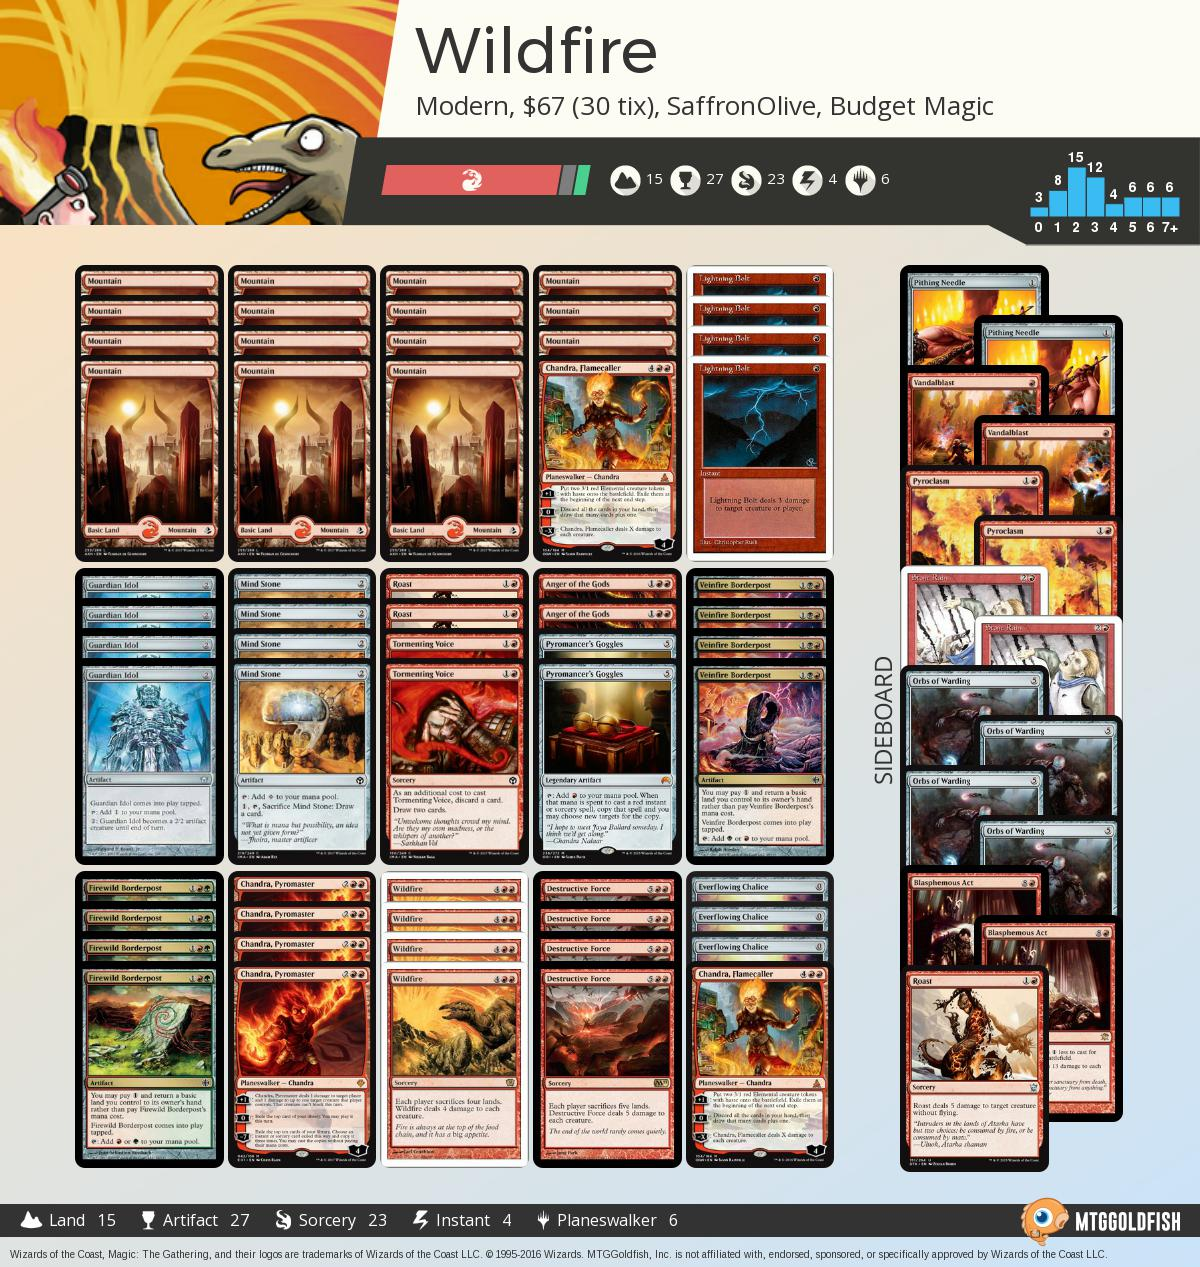 Wildfire 2be27f92 eaef 41d3 bfb0 73647e3cf2b2%2ejpg